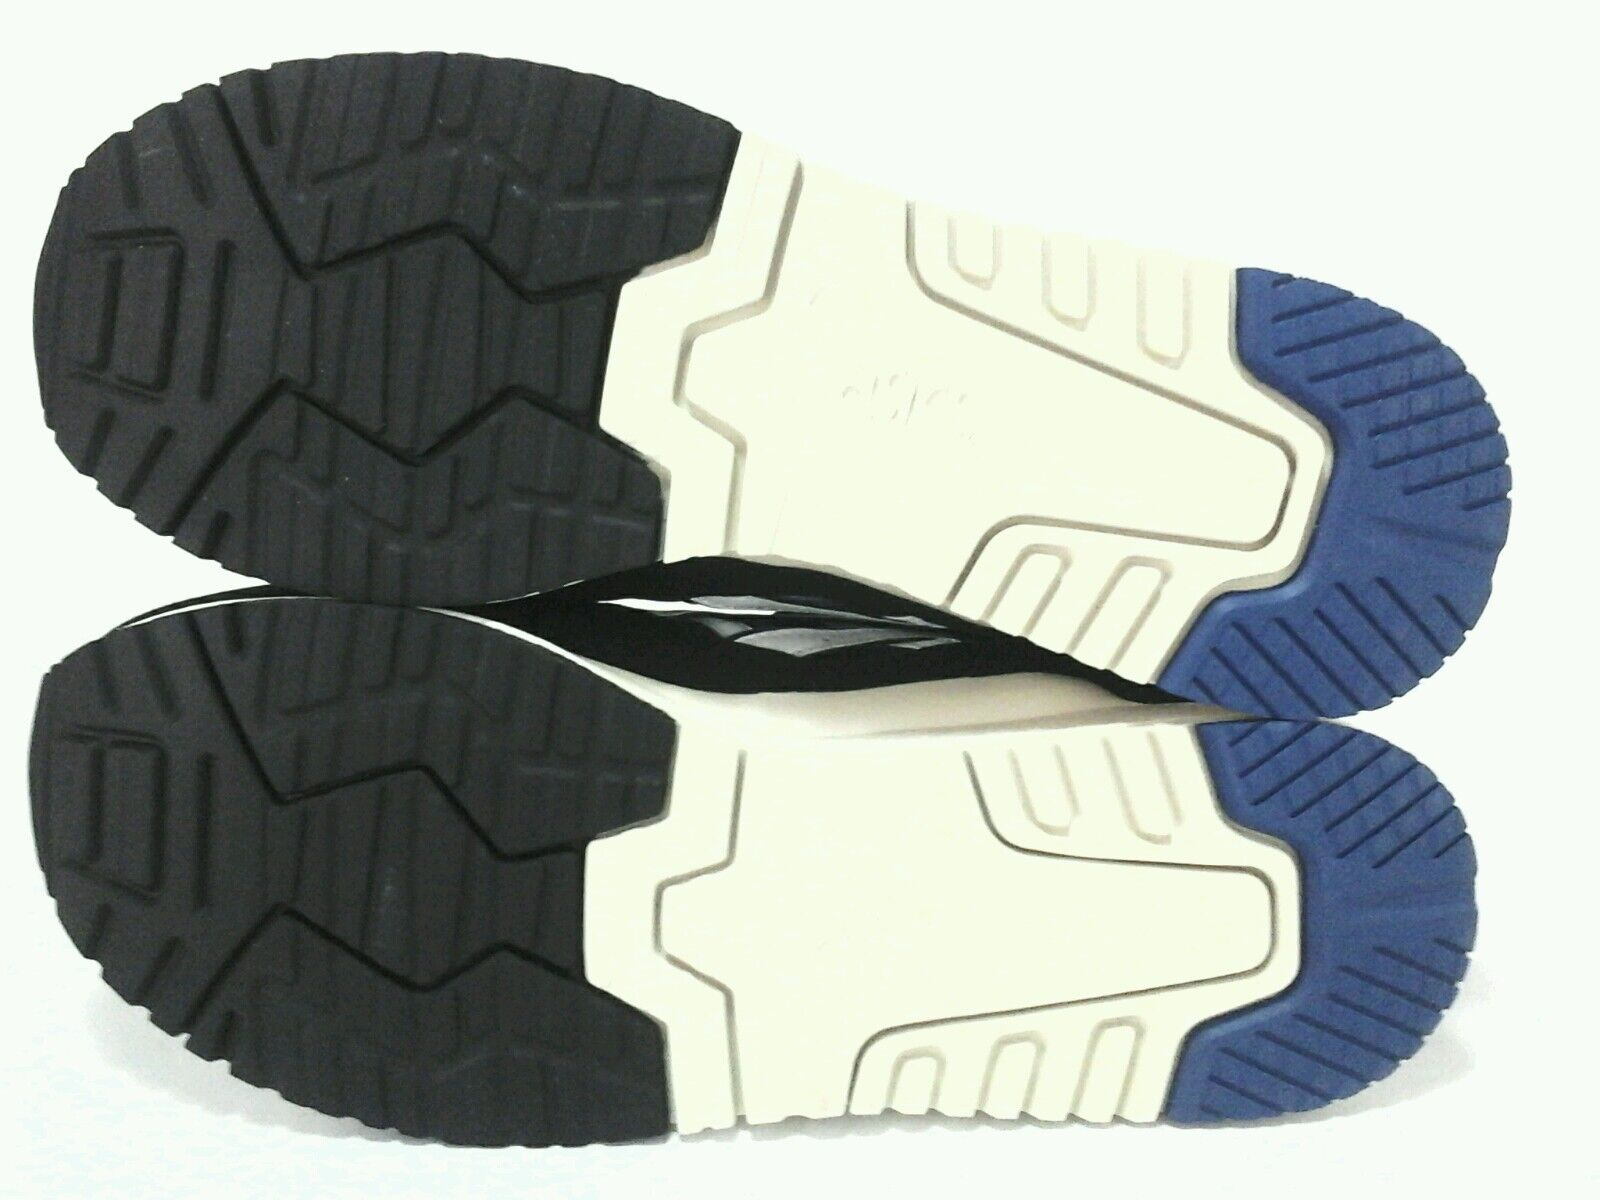 ASICS ASICS ASICS scarpe da ginnastica Gel-Lyte III viola nero SPACE Running scarpe donna 8.5 39.5  120 76a7f5